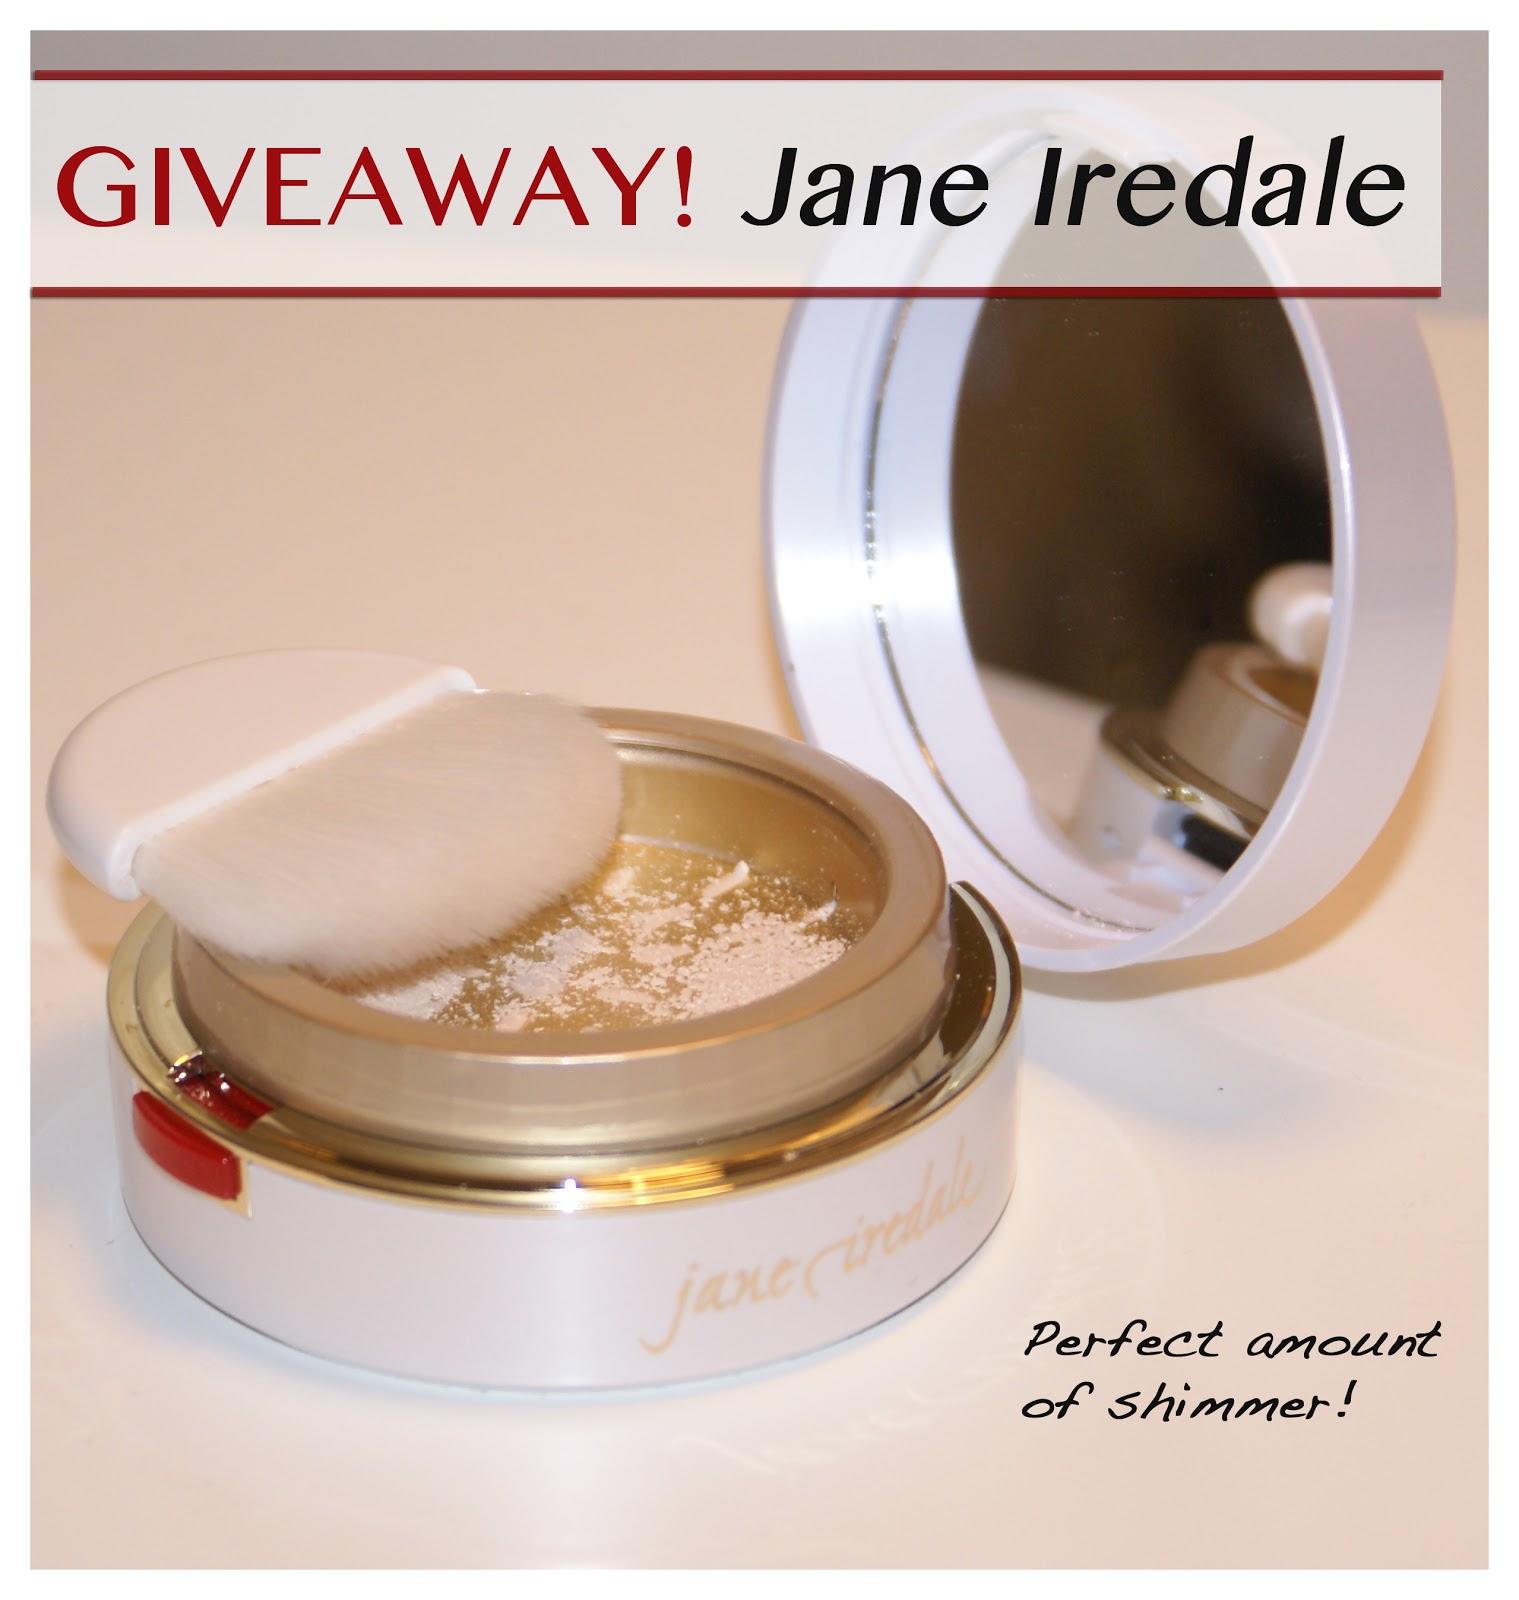 http://4.bp.blogspot.com/-NN2kl-mL8oE/UMHK_cRwPtI/AAAAAAAAIQw/DajbUrWHd5Q/s1600/Jane+Iredale+ED.jpg